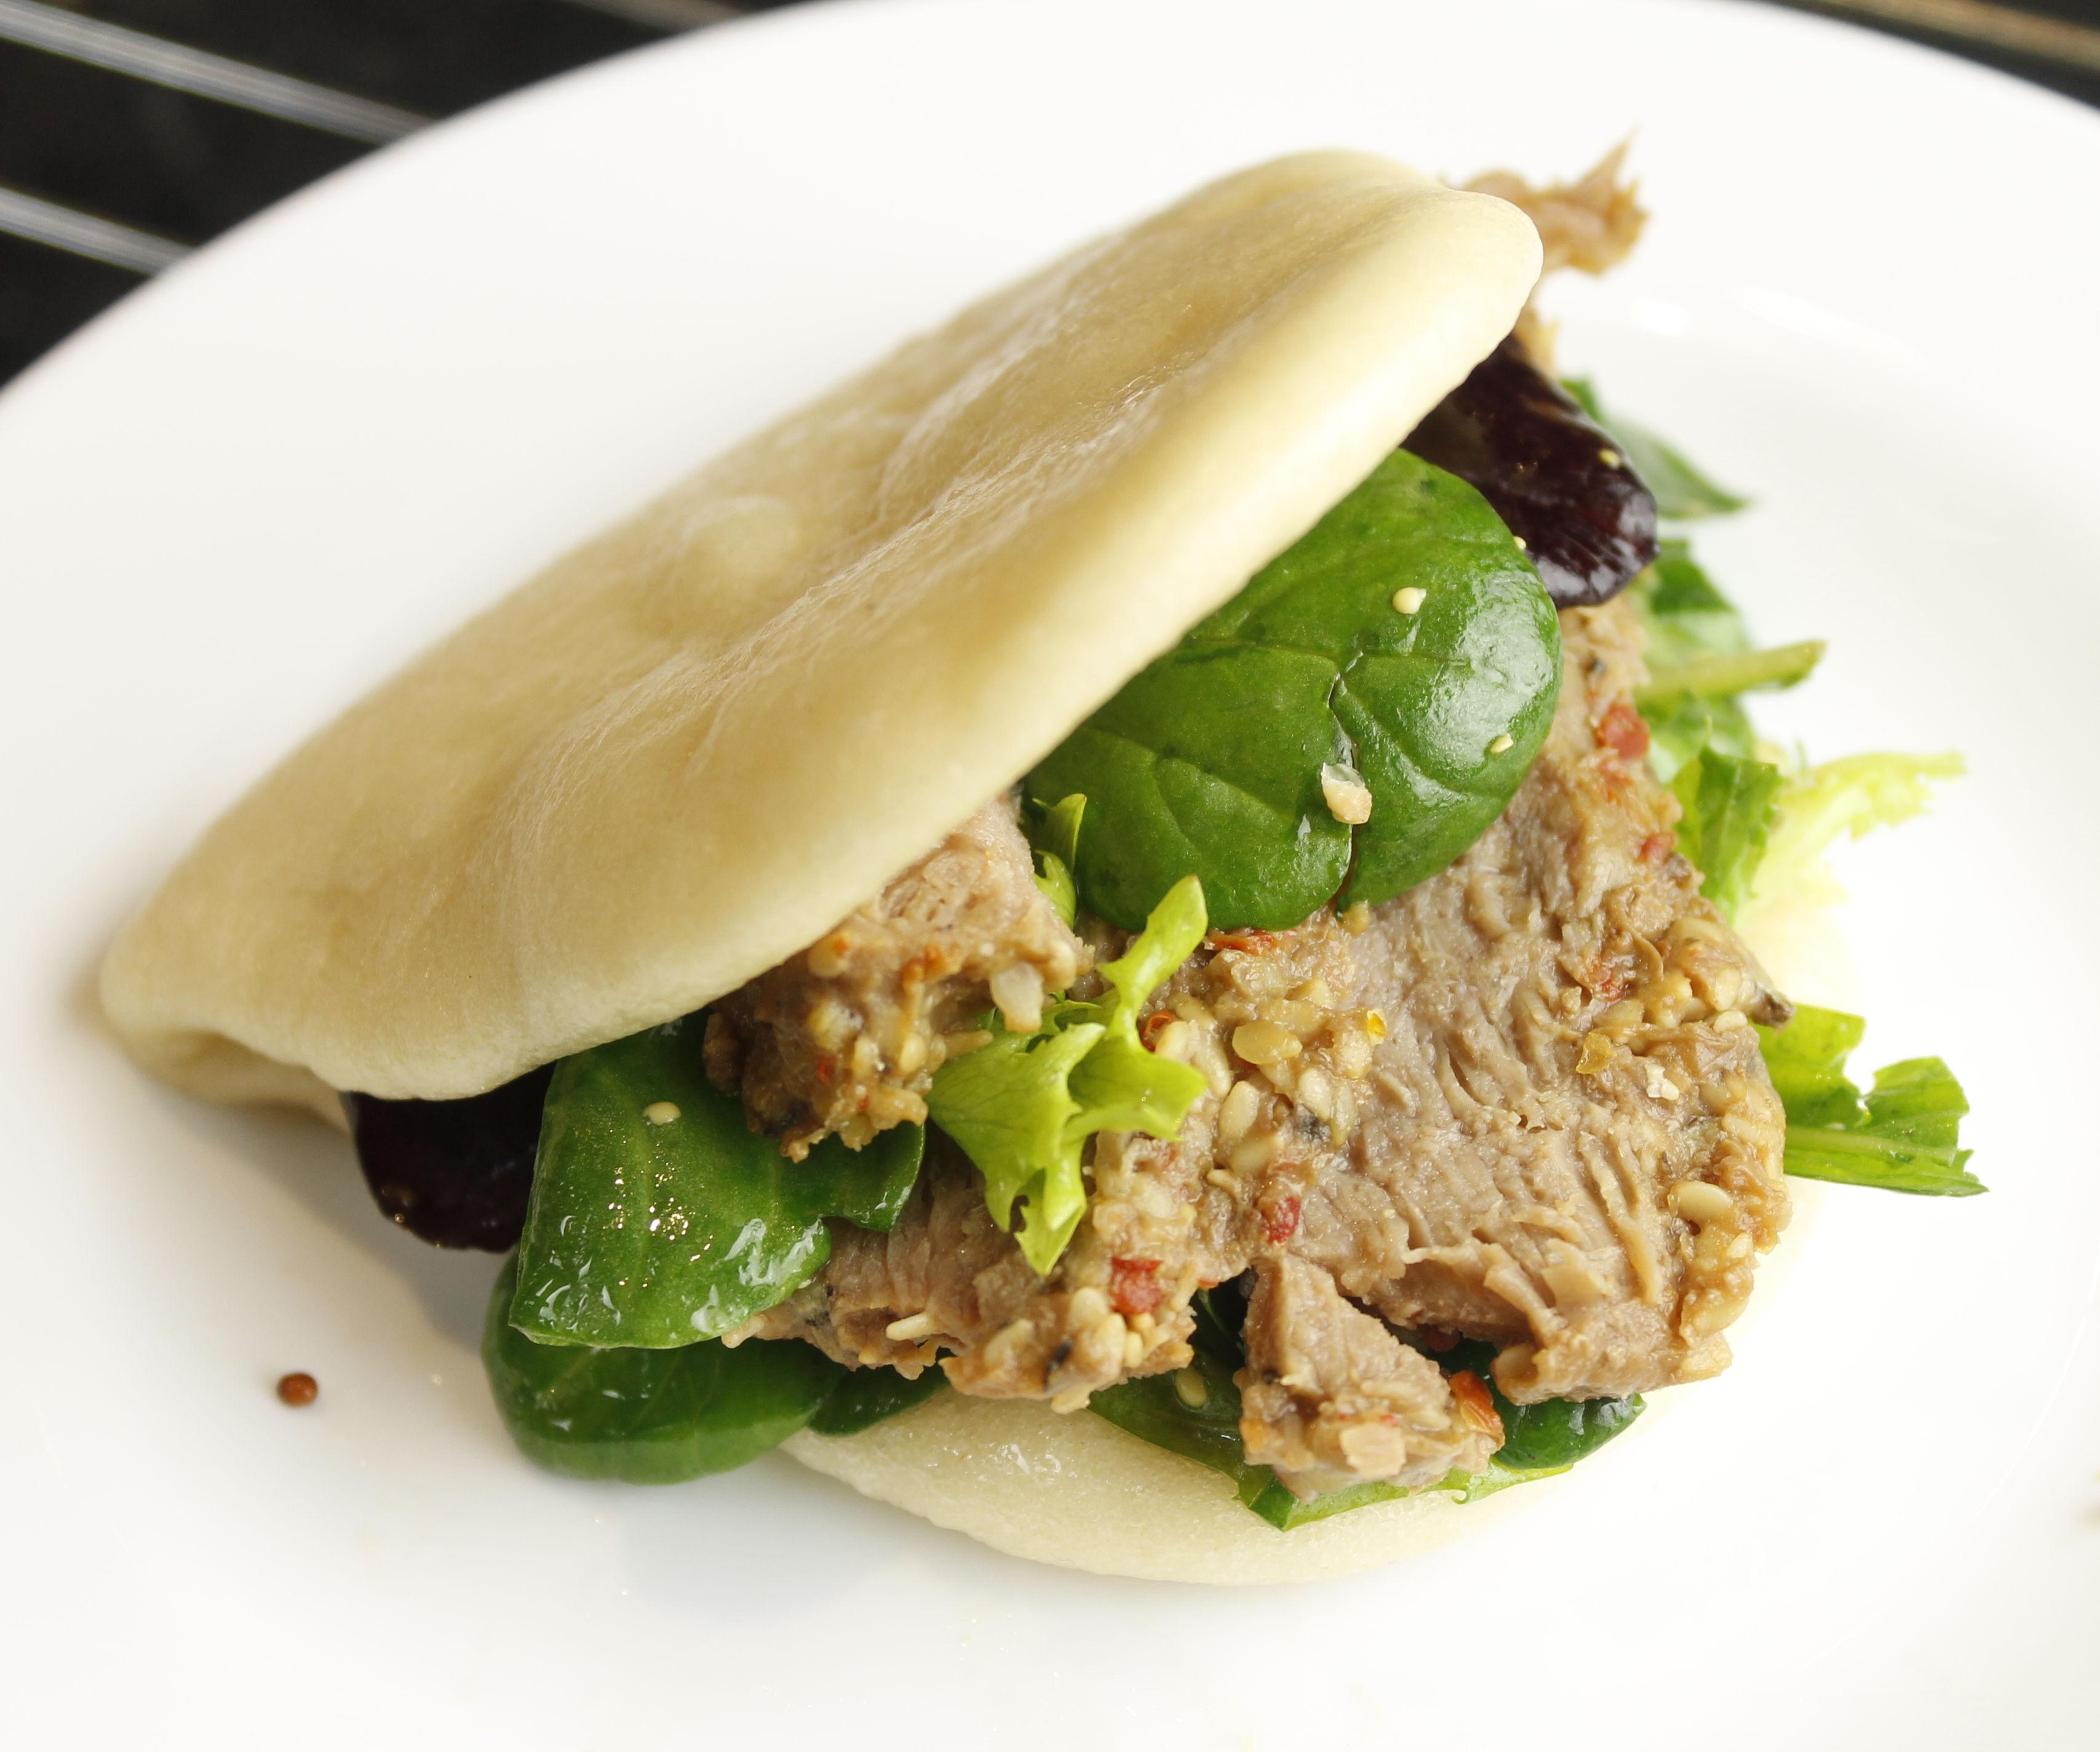 How to Make Sourdough Steamed Buns (Gua Bao)